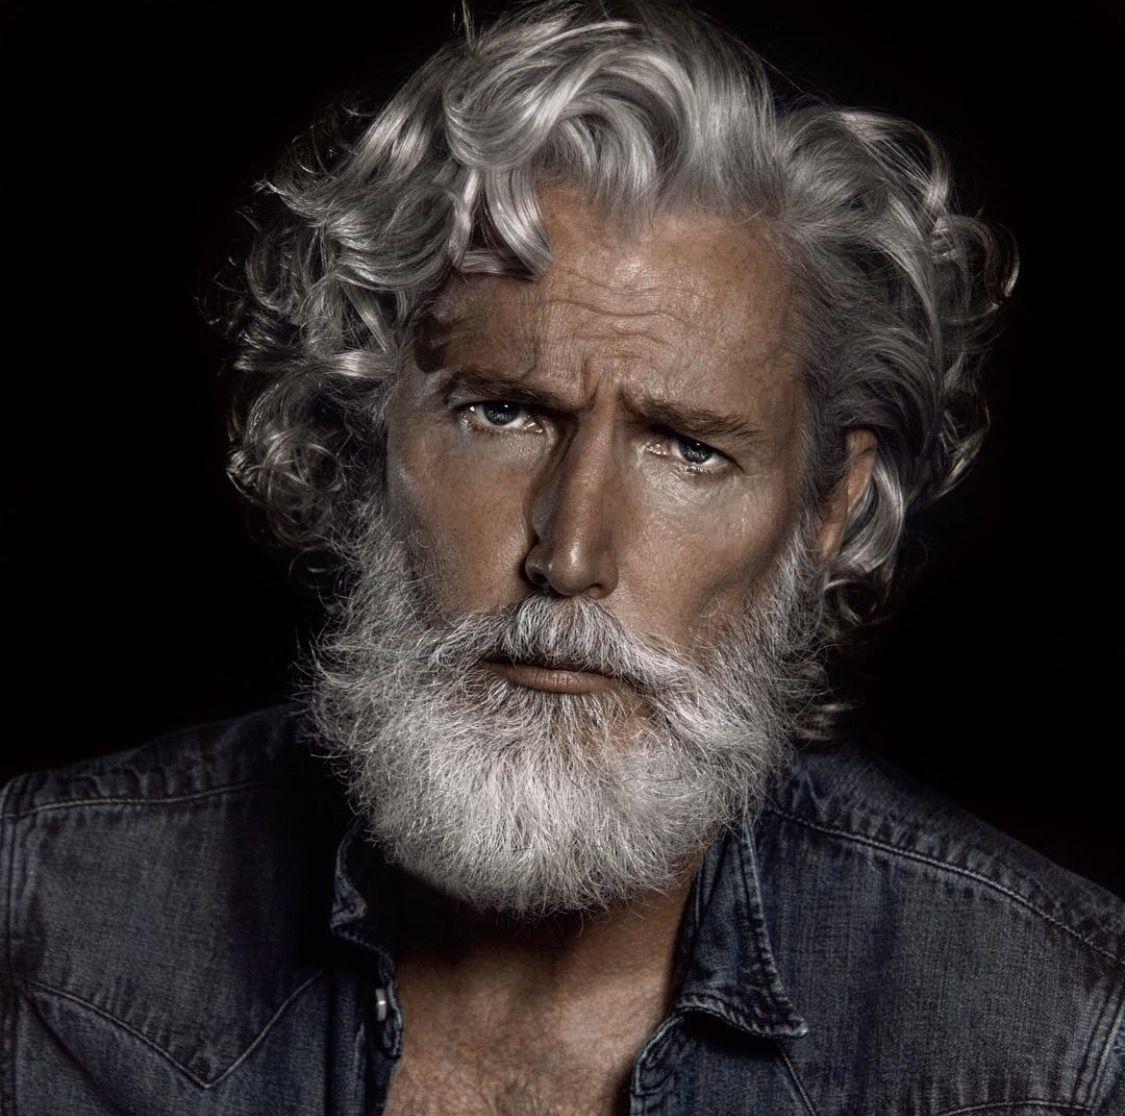 Www Edodream Work Grey Hair Men Curly Hair Men Mens Hairstyles With Beard